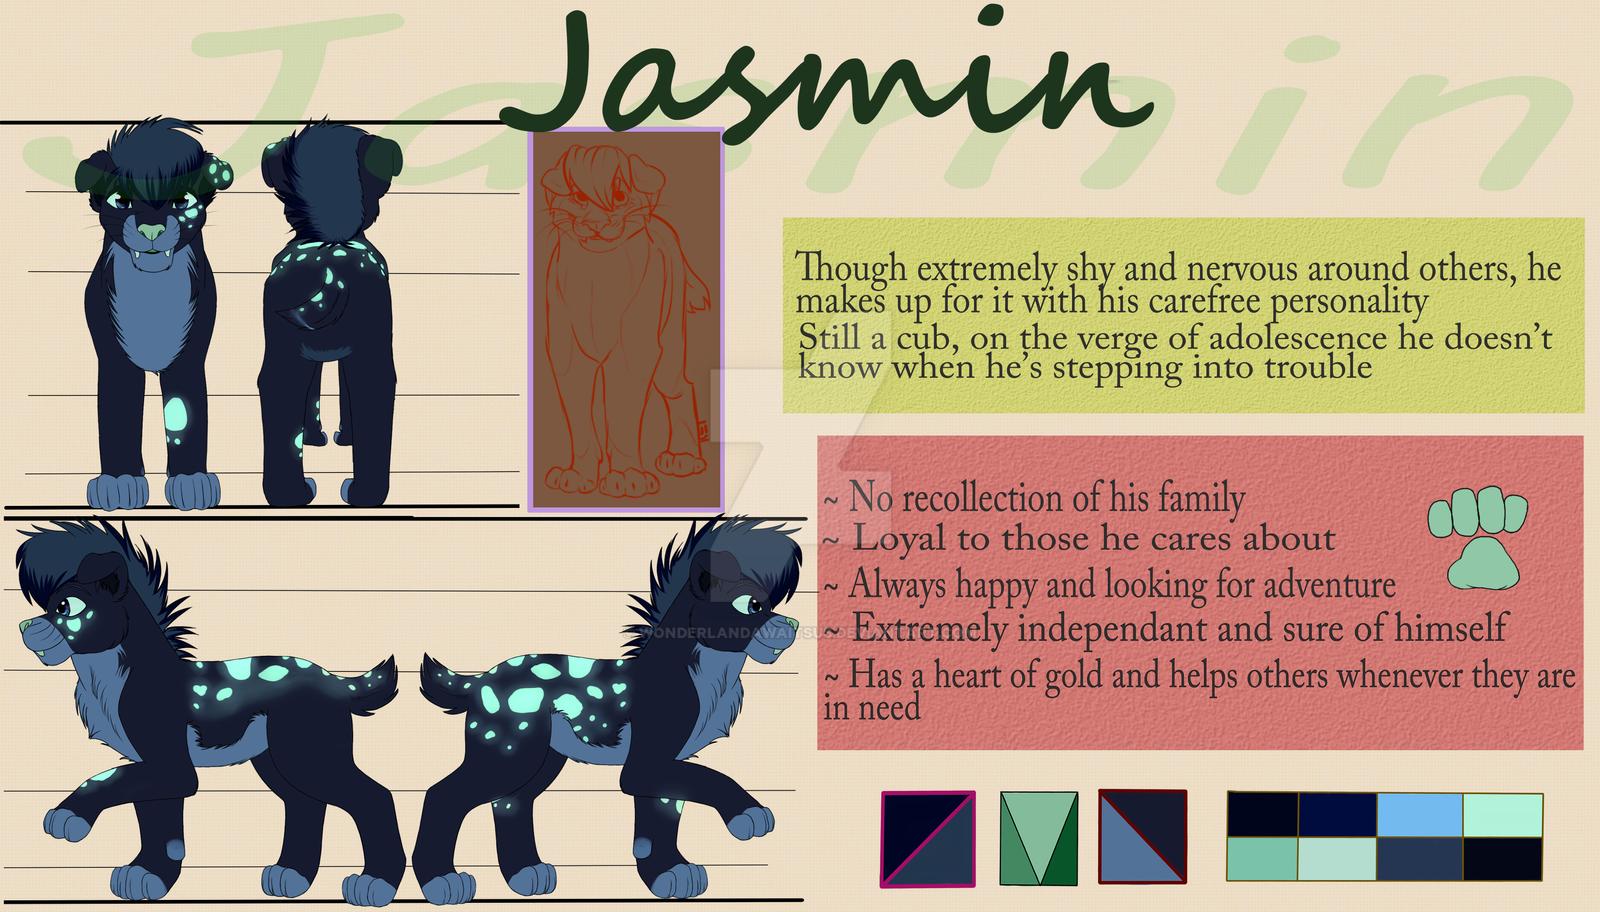 Jasmin Ref. Sheet revamped by Wonderlandawaitsus